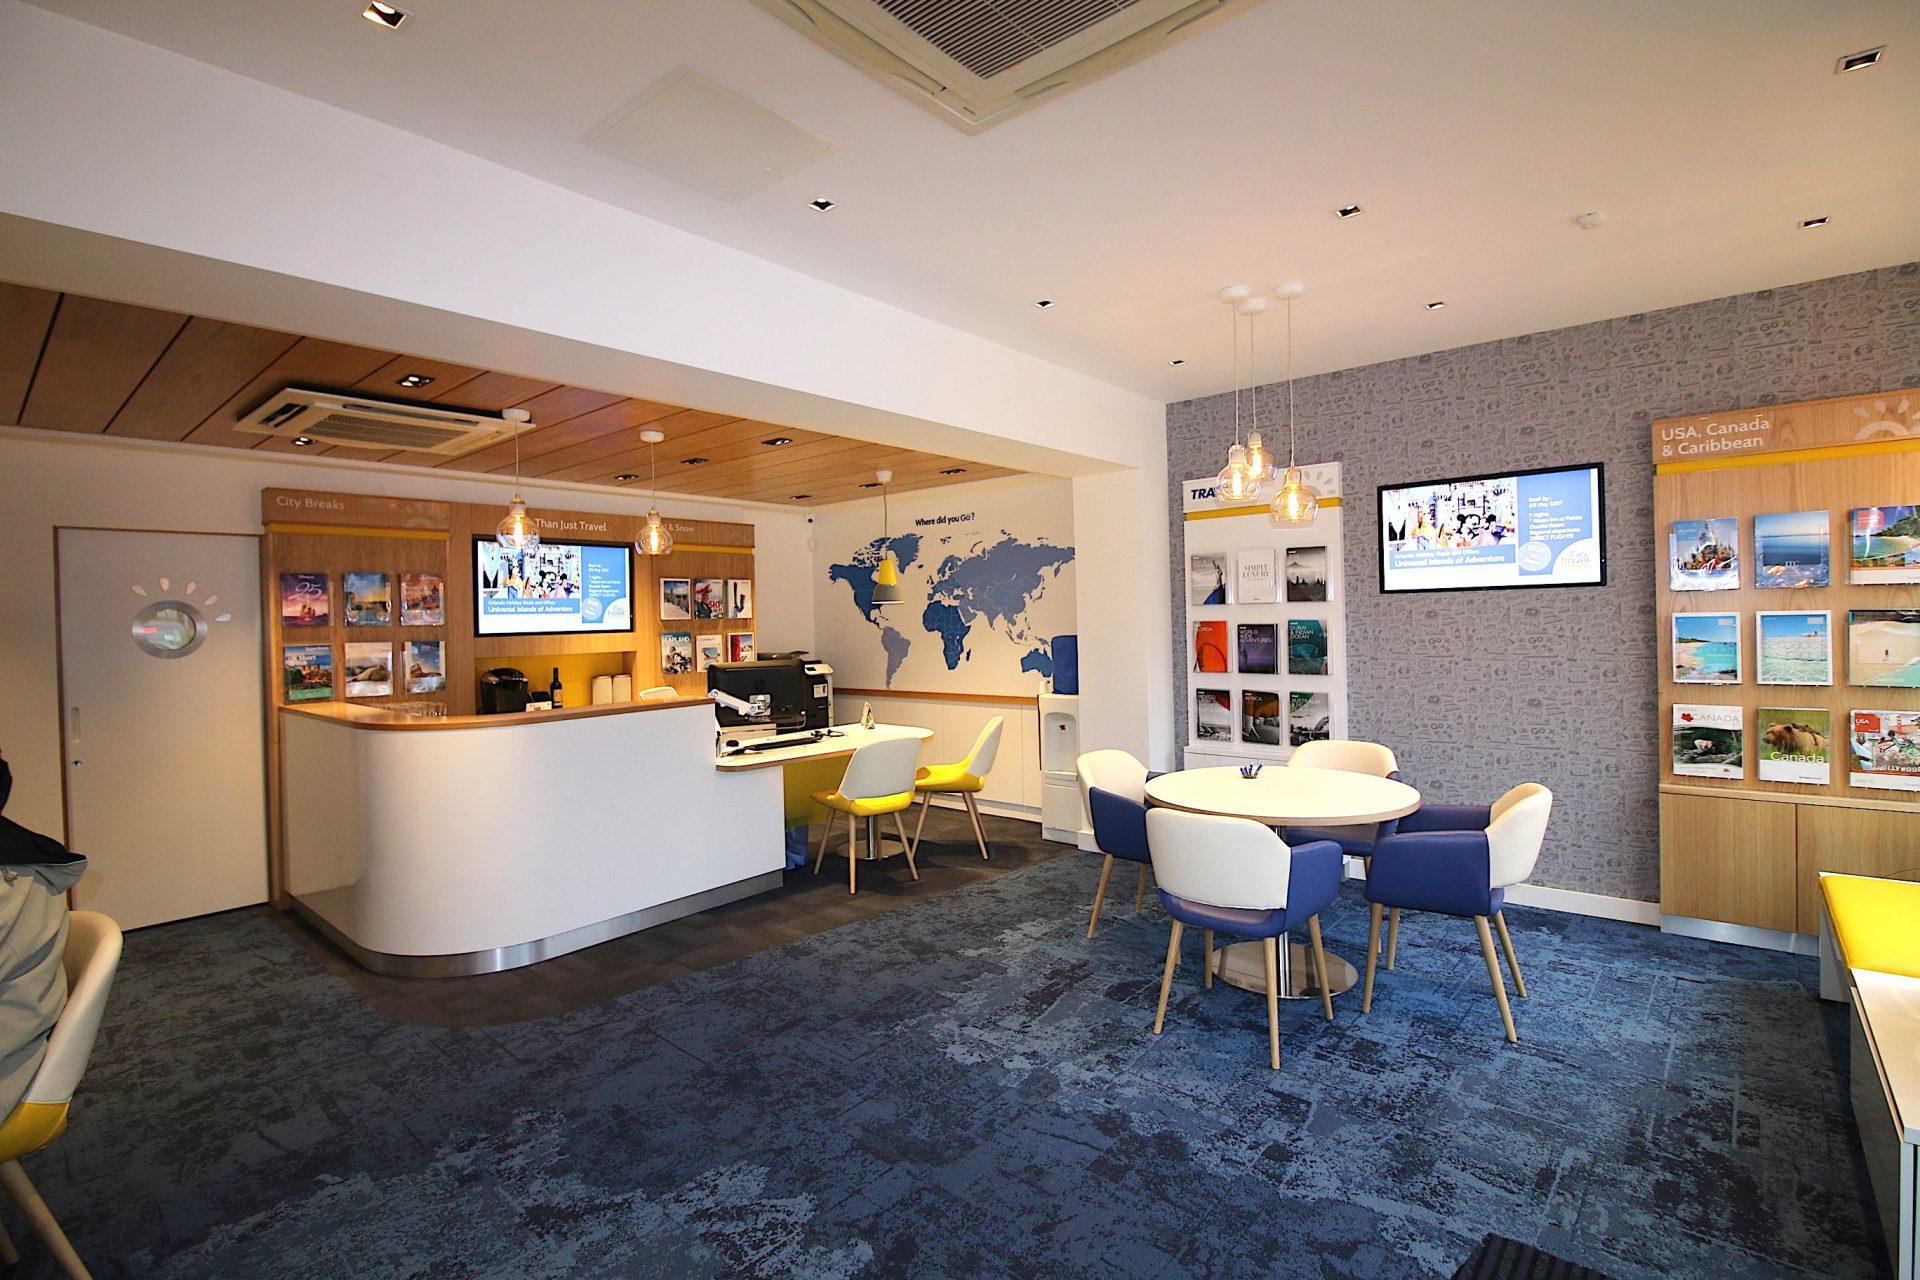 Go Travel_Chislhrust_Interior Design By Nugget Design 02